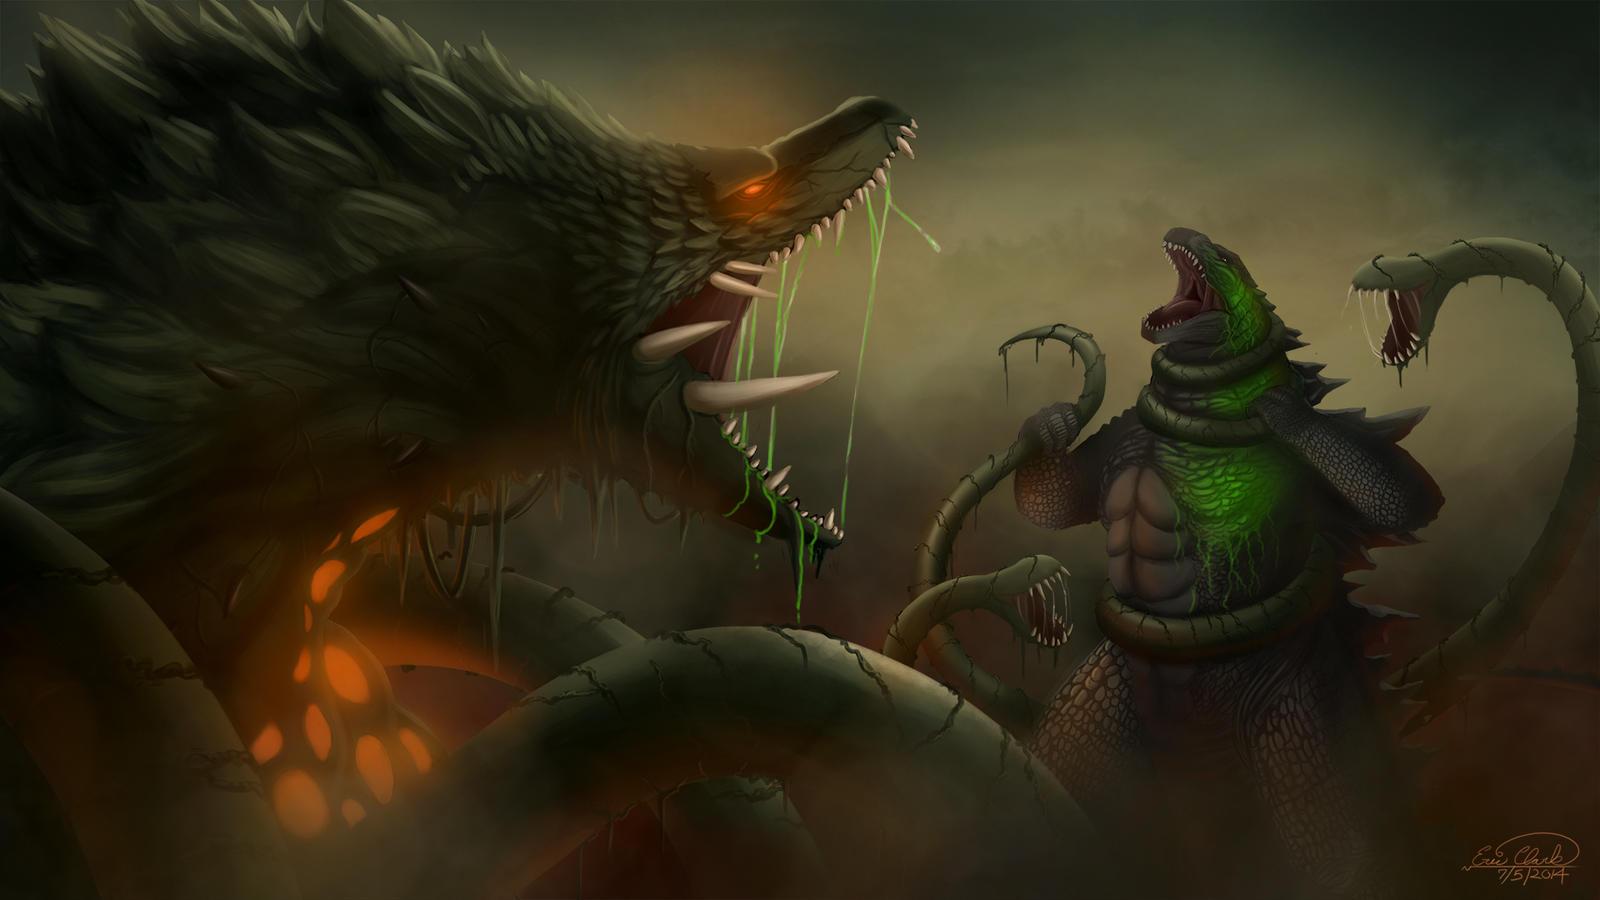 Godzilla Vs Biollante By Sawuinhaff On DeviantArt